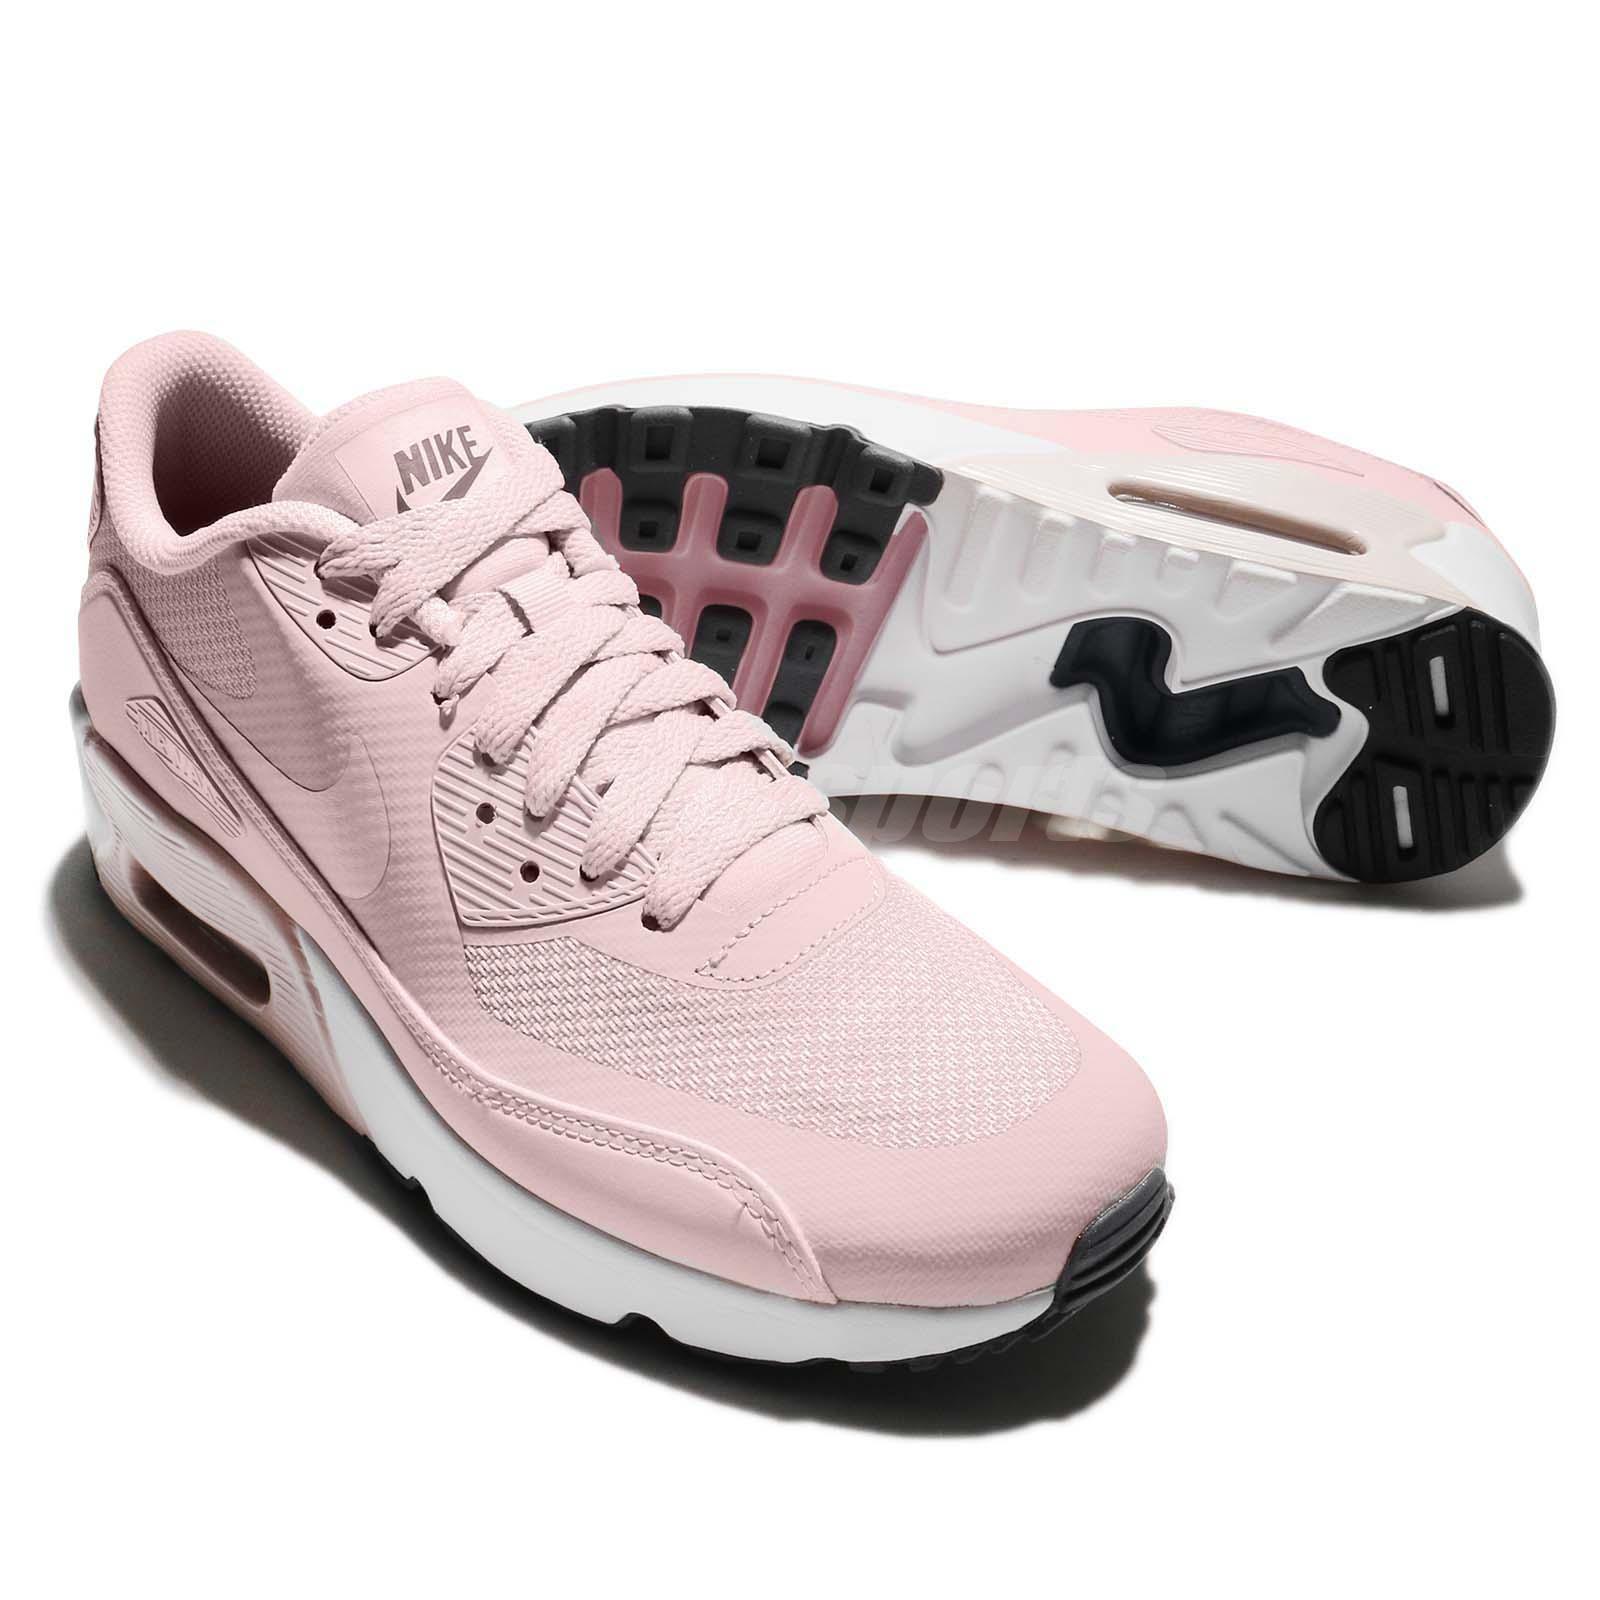 pretty nice 056ba e2df0 Nike Air Max 90 Ultra 2.0 GS Barely Rose Pink Women Kid Running ...